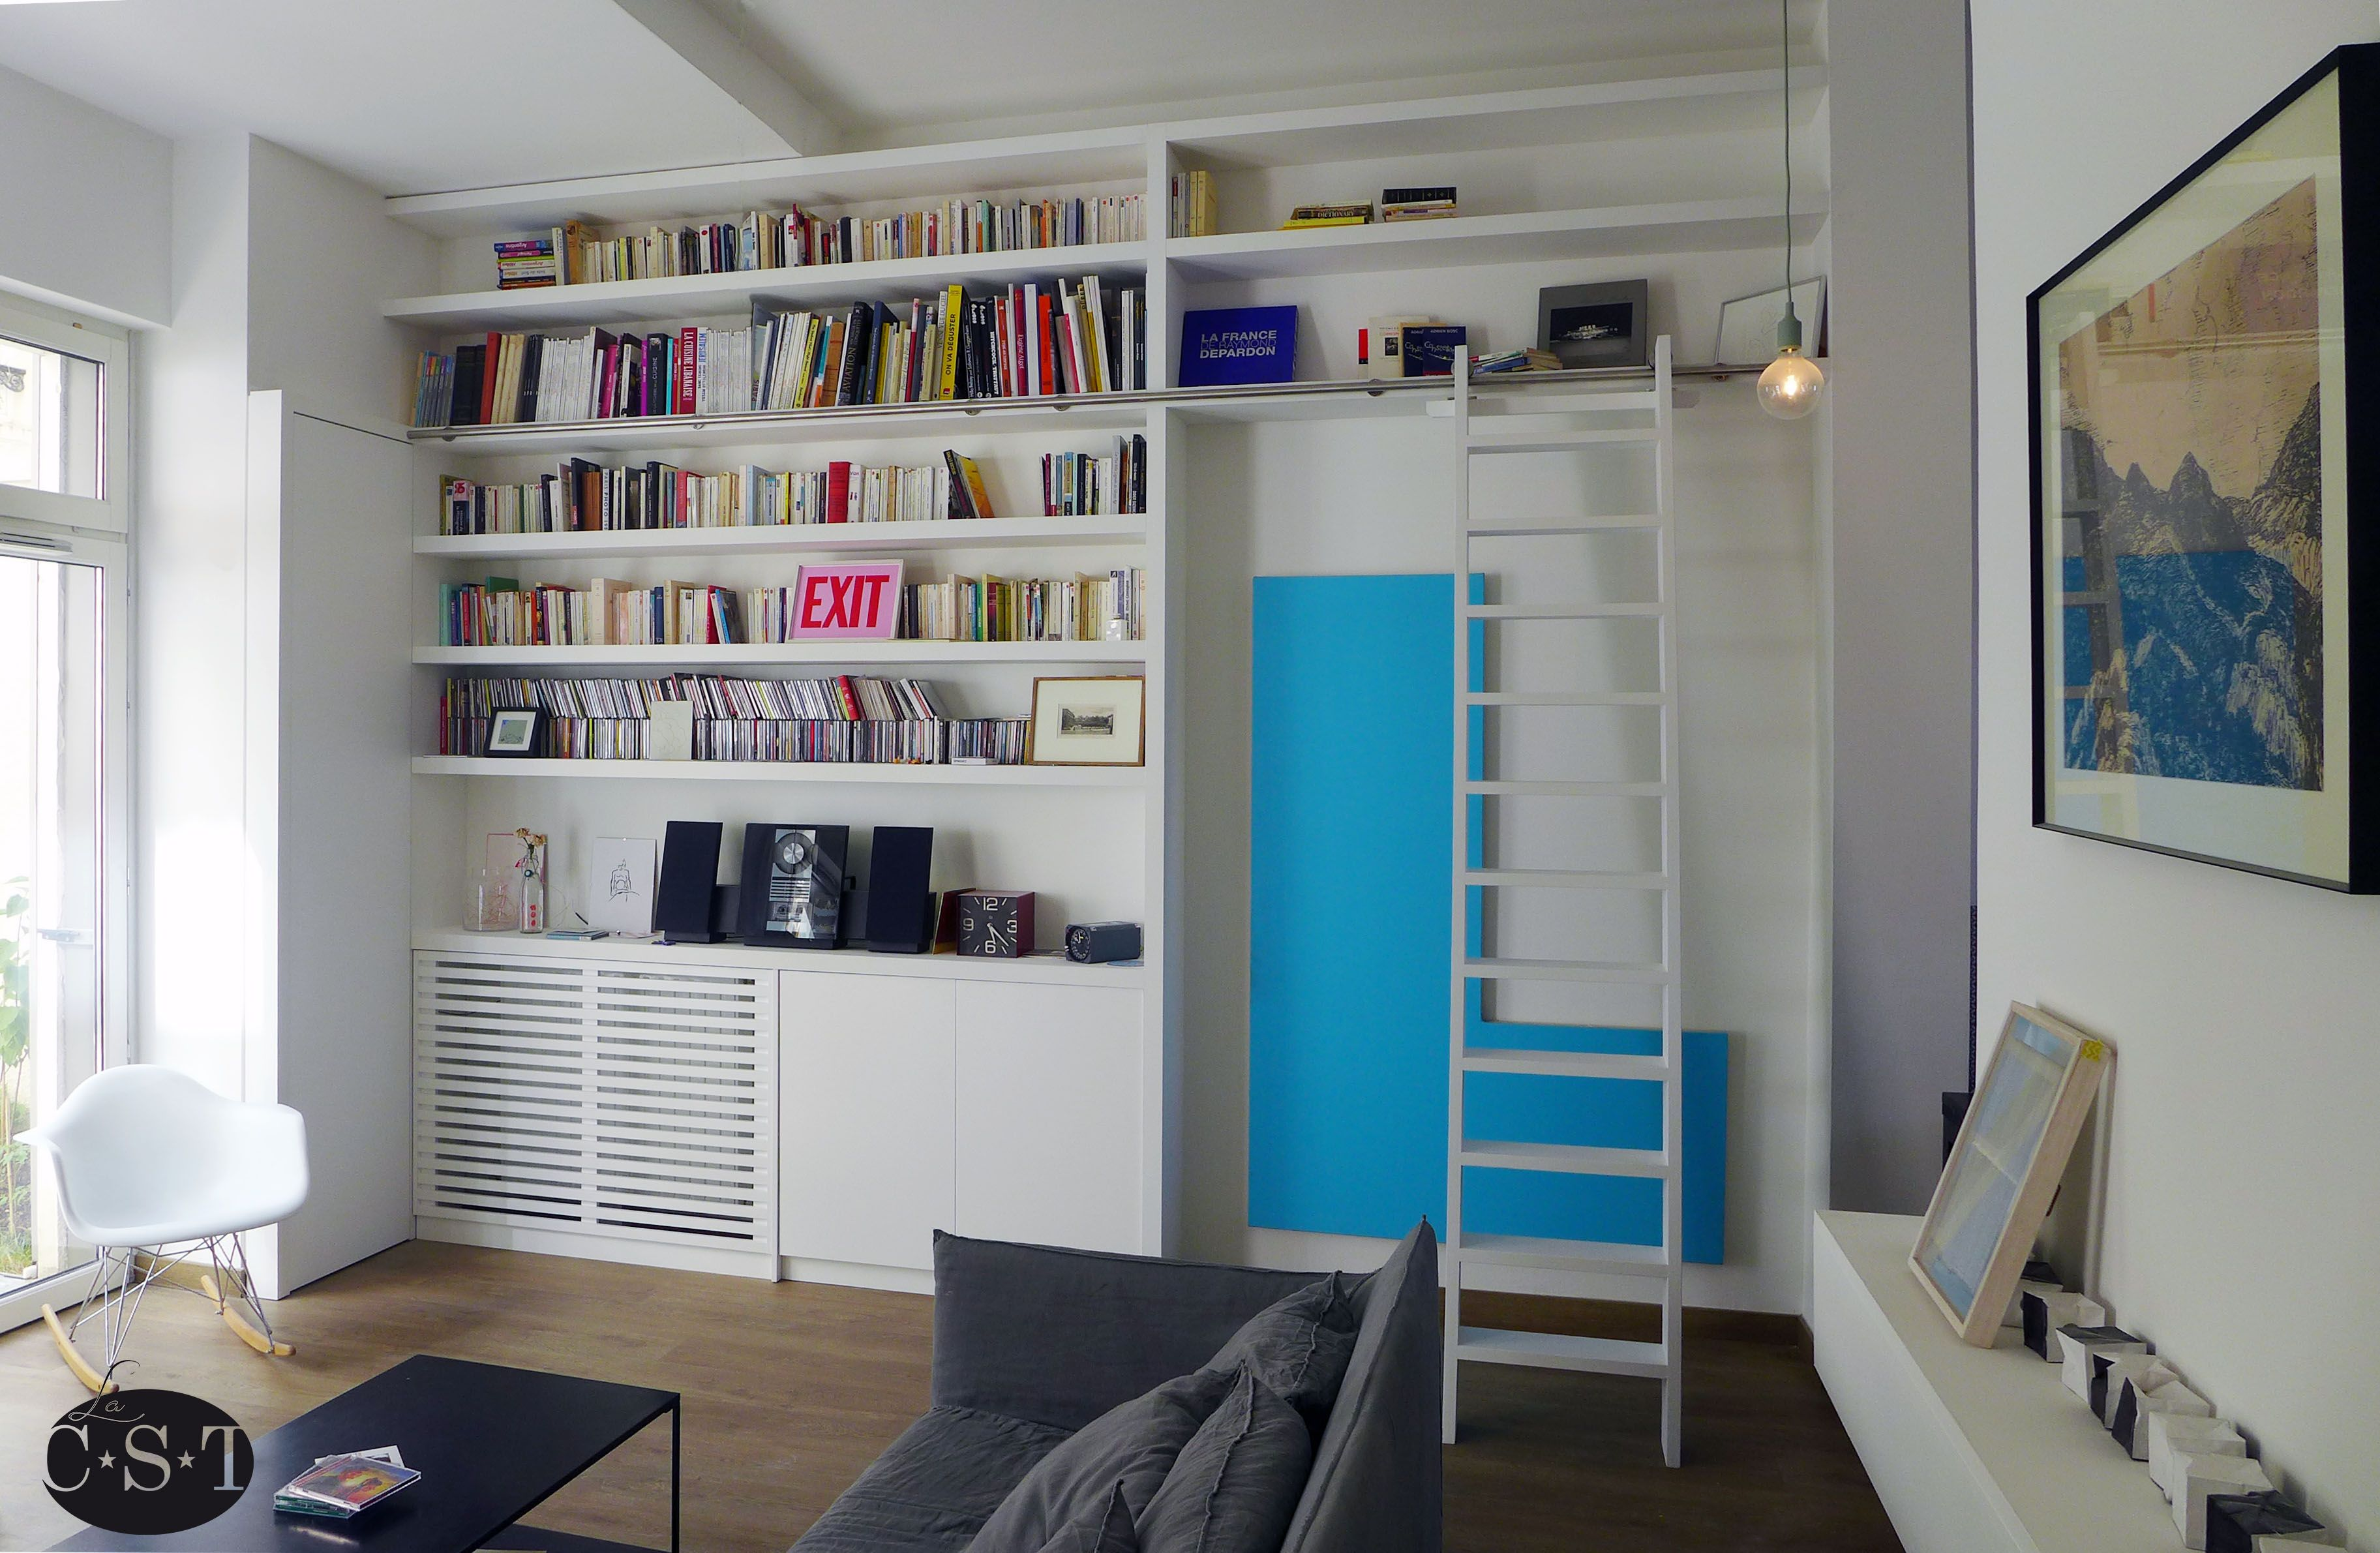 Biblioth Que L Aspect Ma Onn Esprit Loft Industriel Grande  # Idee Meuble Hifi Et Bibliotheque